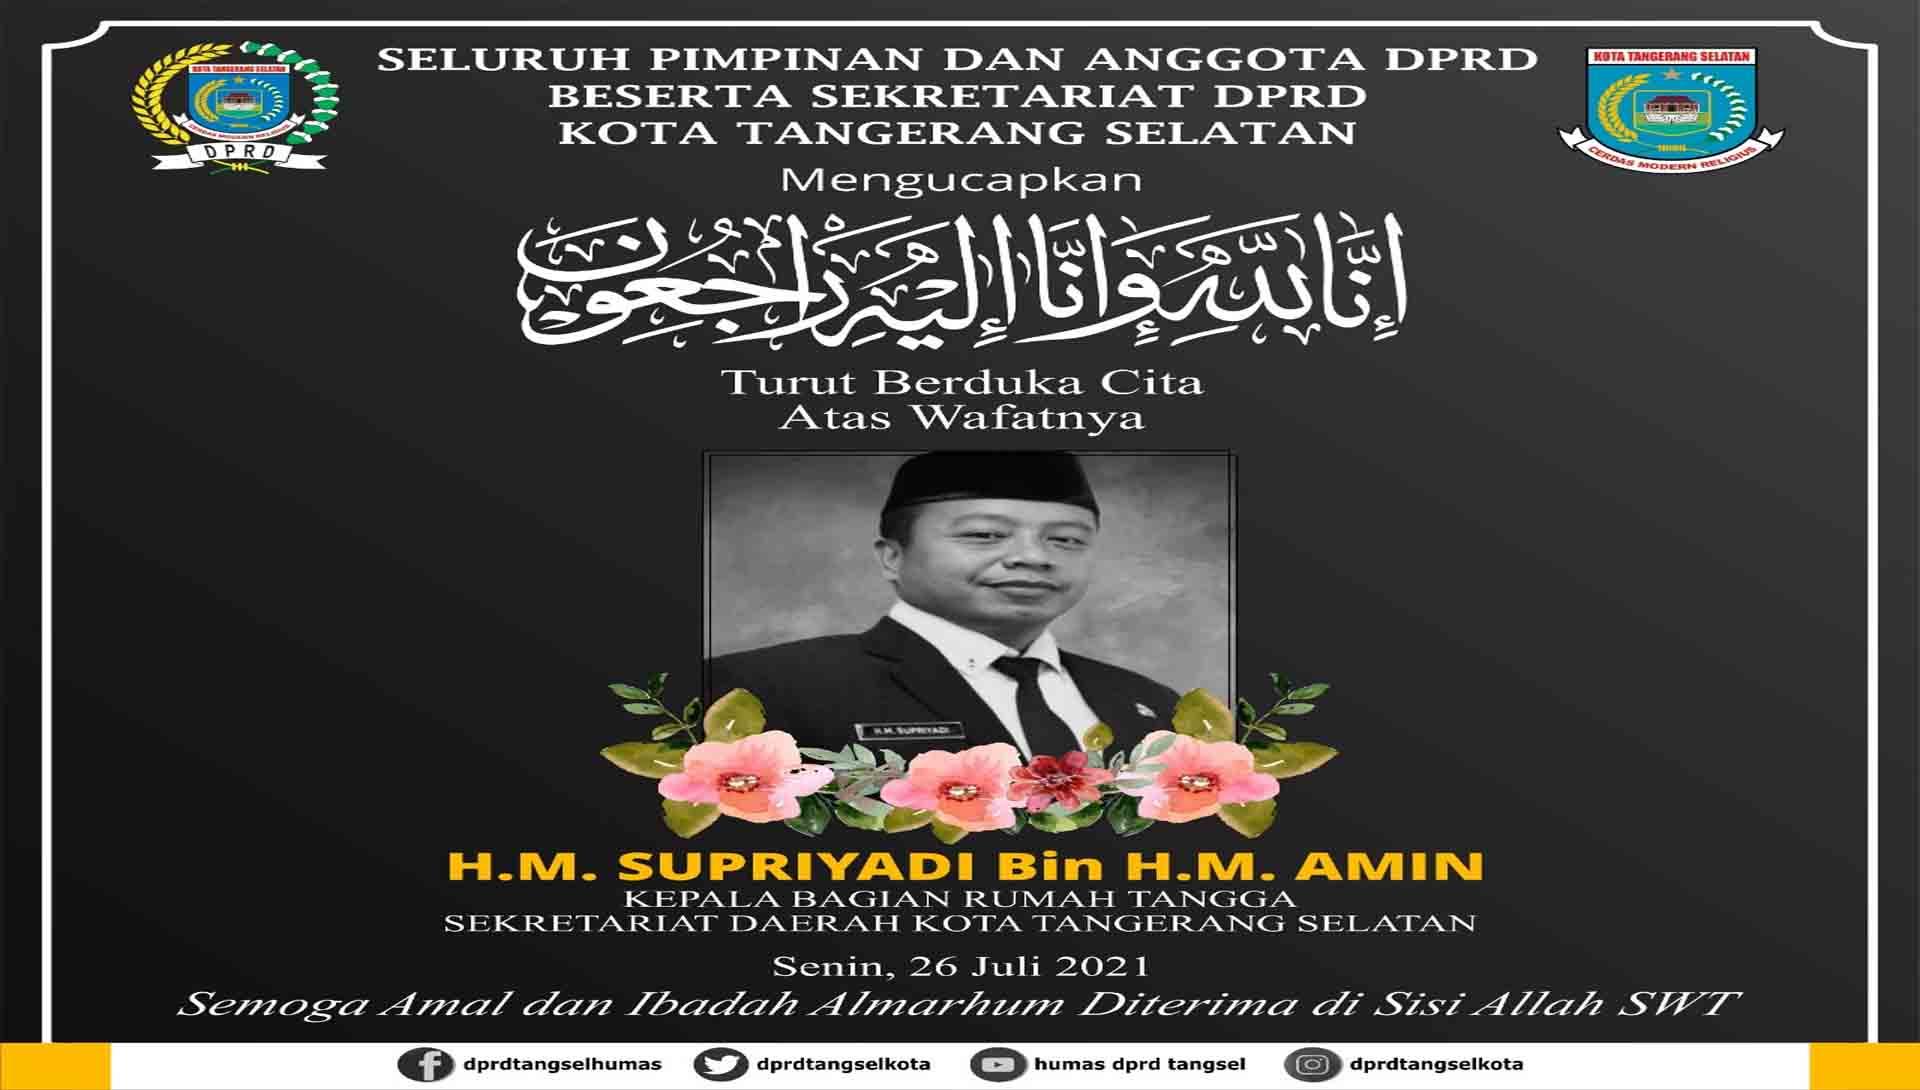 Turut Berduka Cita atas Wafatnya H.M. Supriyadi Bin H.M. Amin